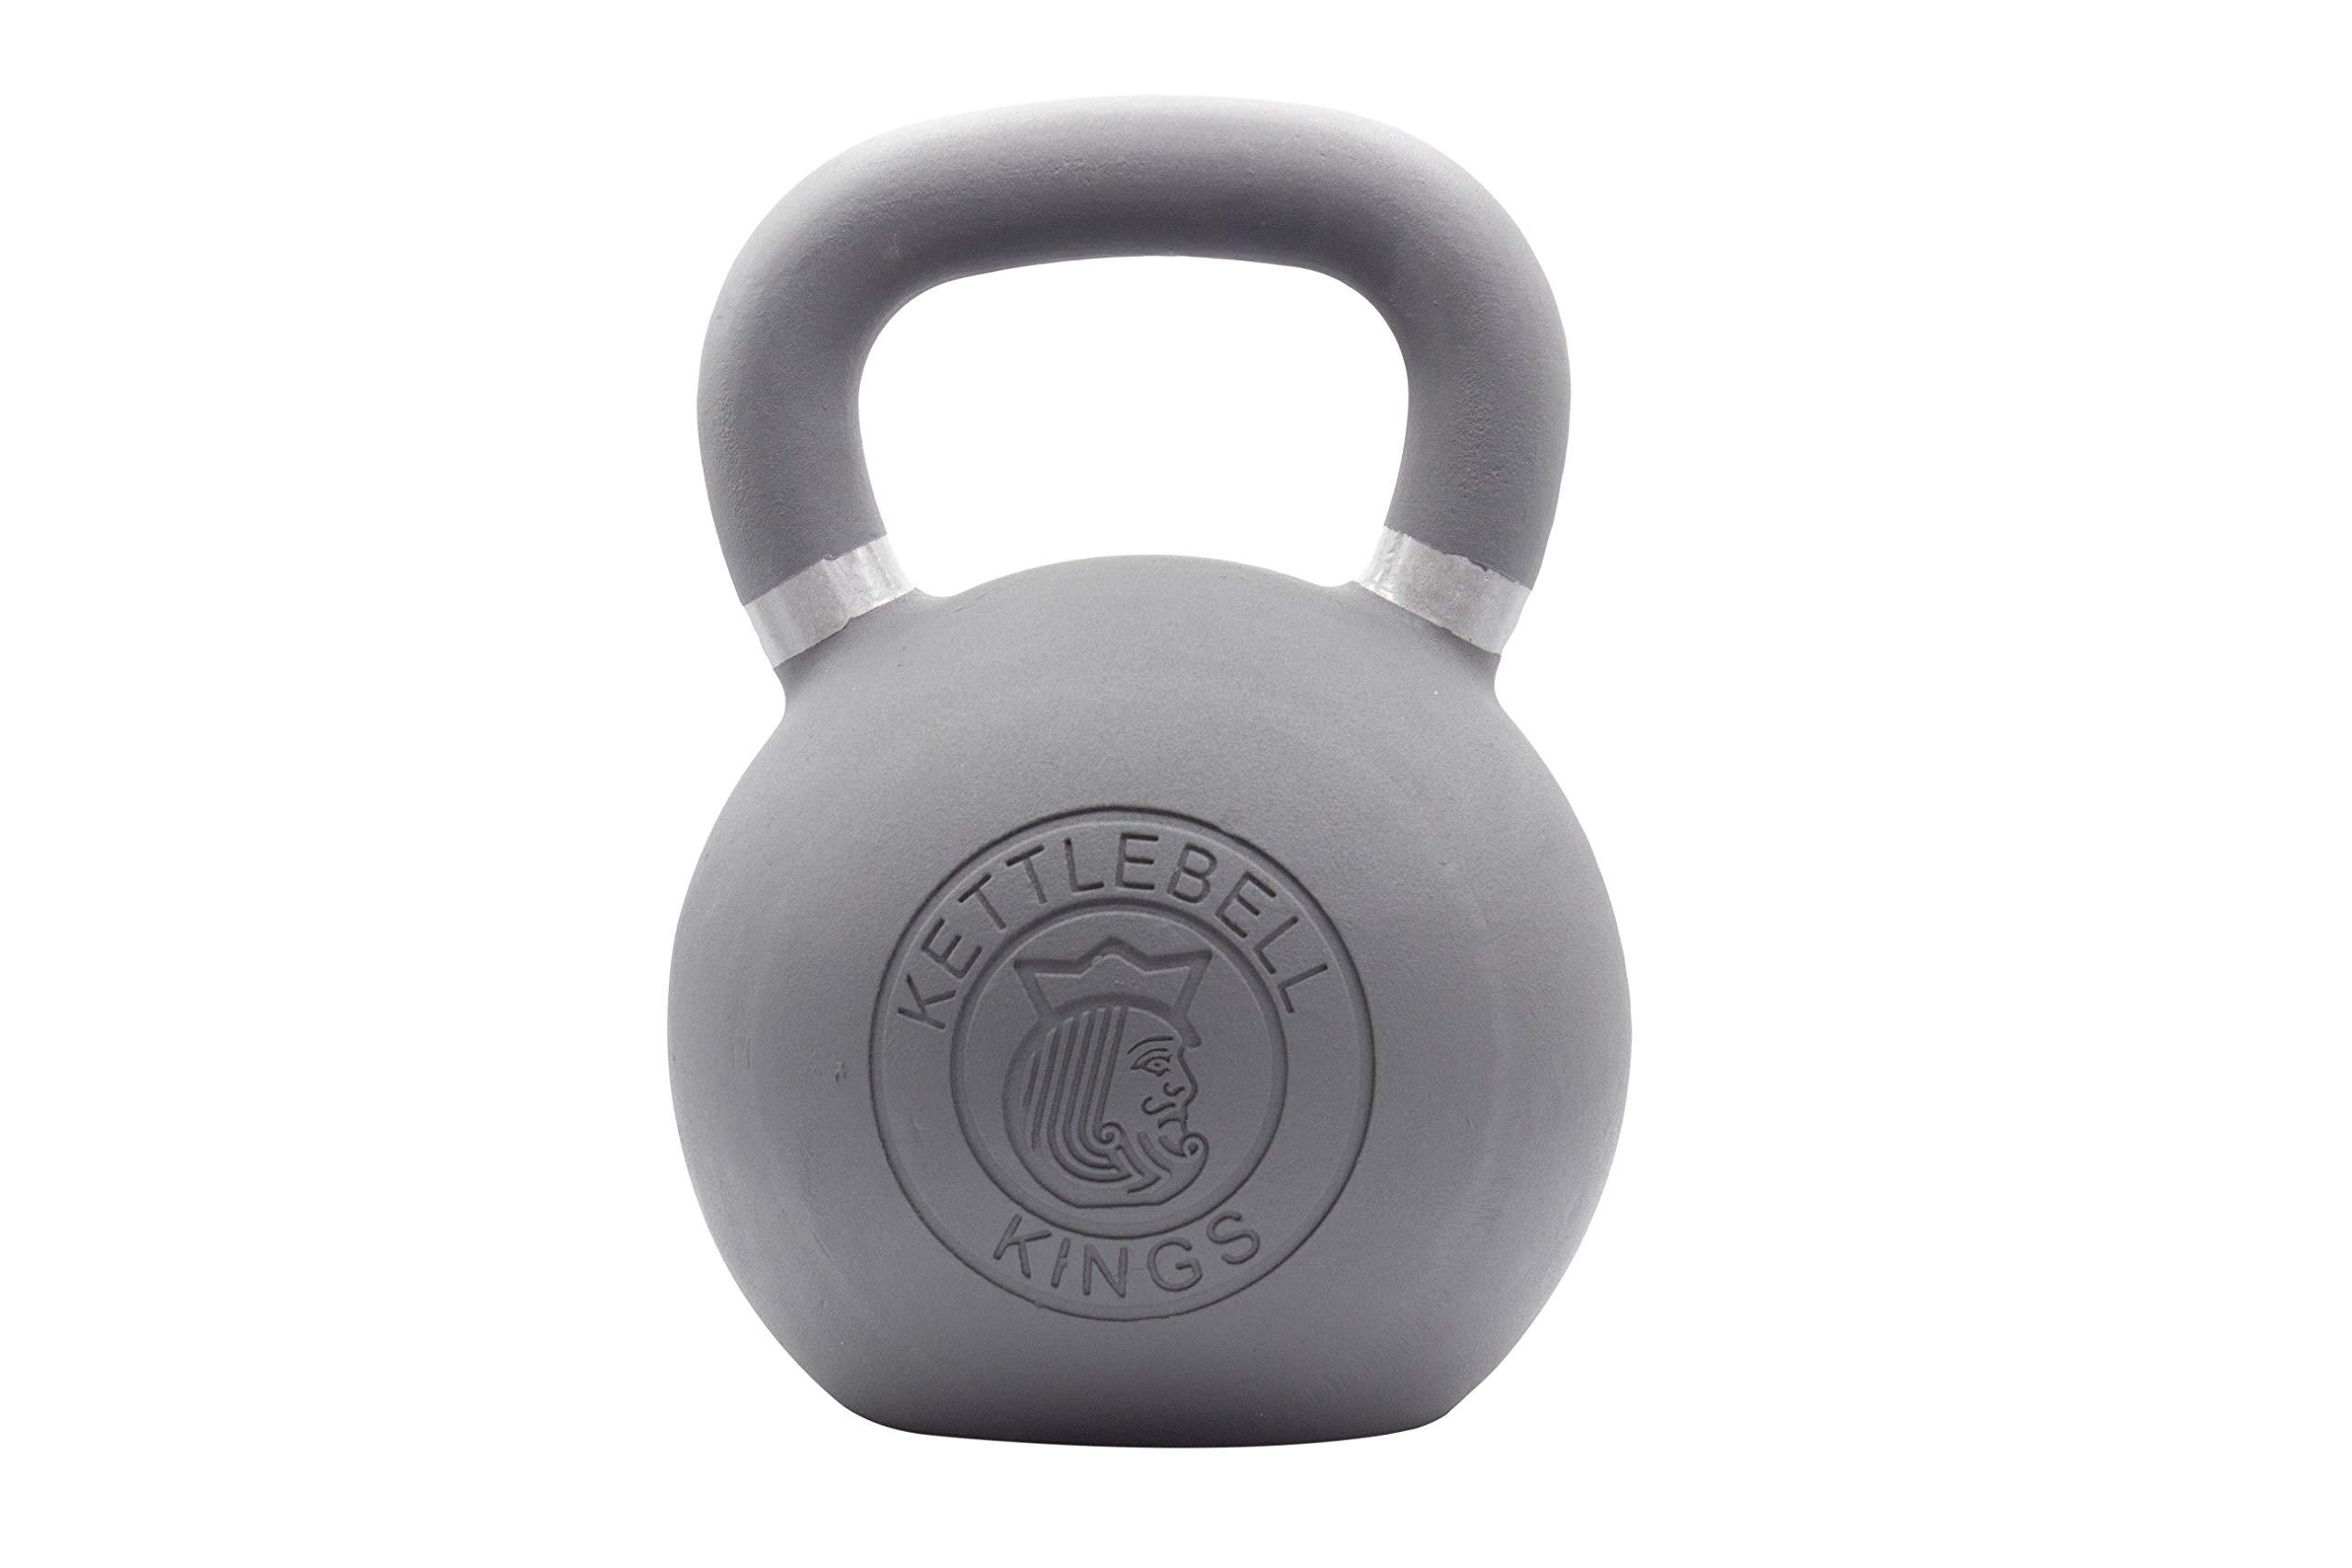 Kettlebell Kings | Kettlebell Weights | Powder Coat Kettlebell Weights for Women & Men | Powder Coating for Durability, Rust Resistance & Longevity (44)